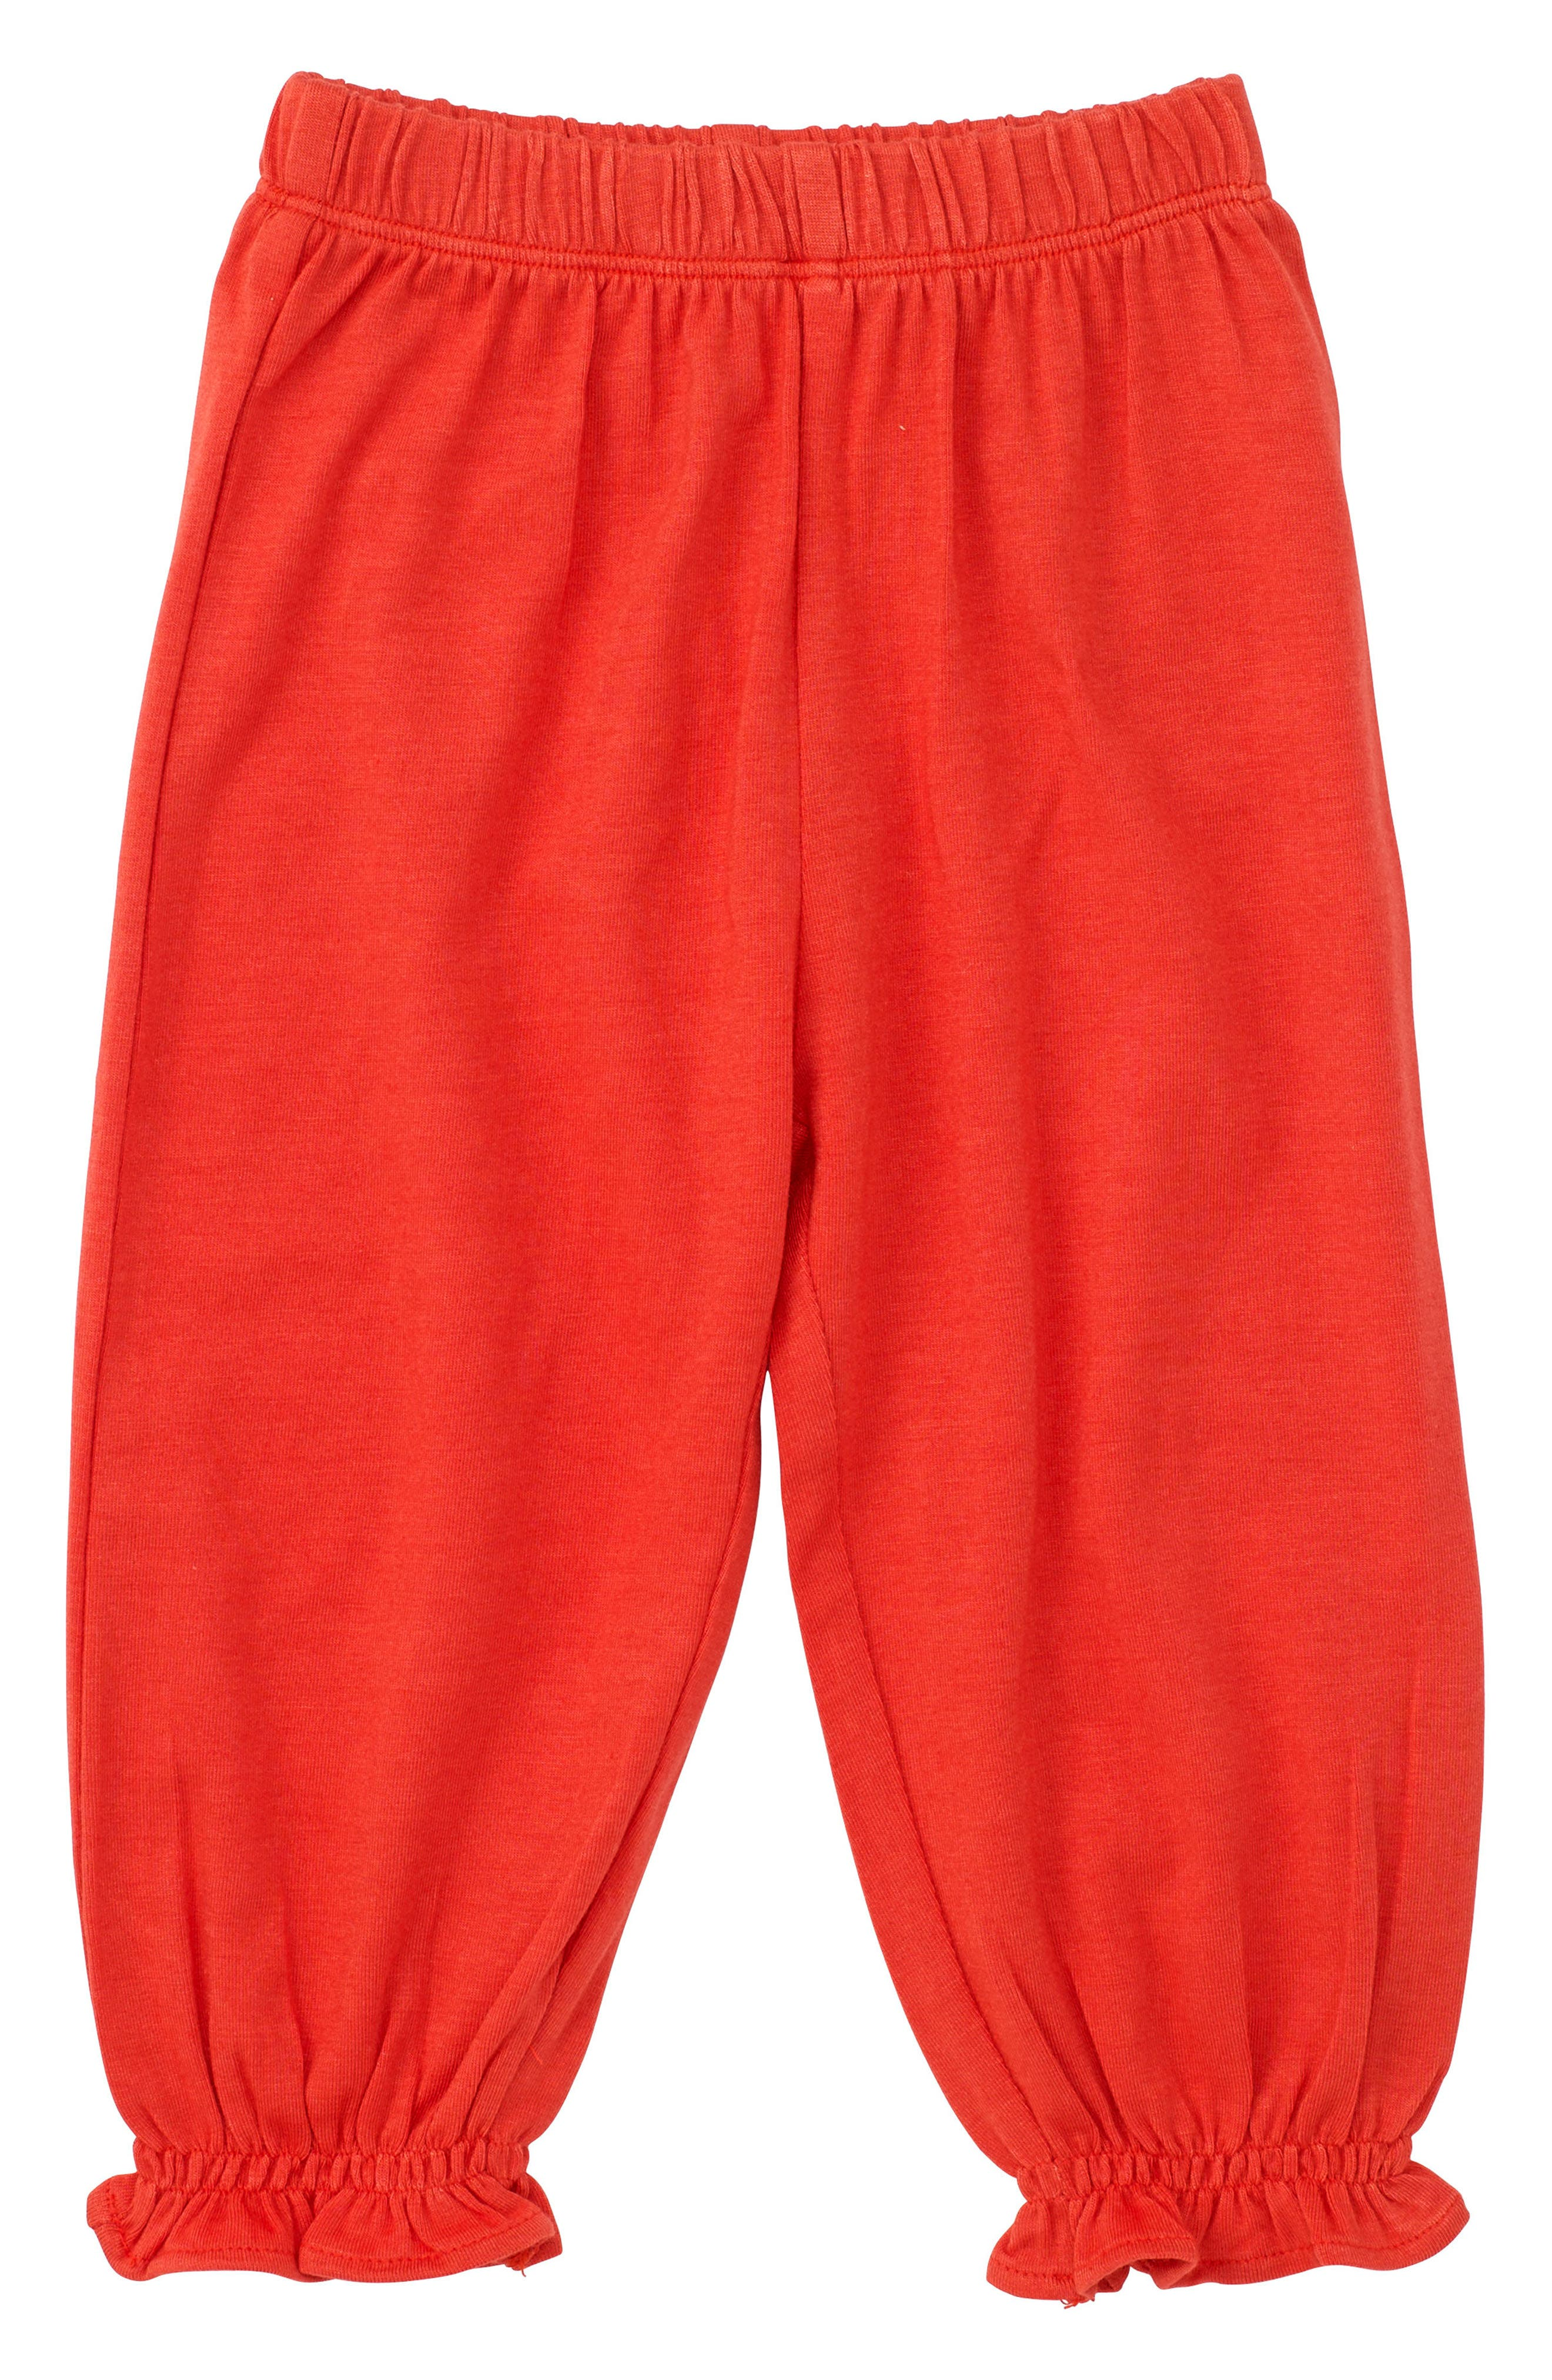 Raga Pants,                         Main,                         color, Coral